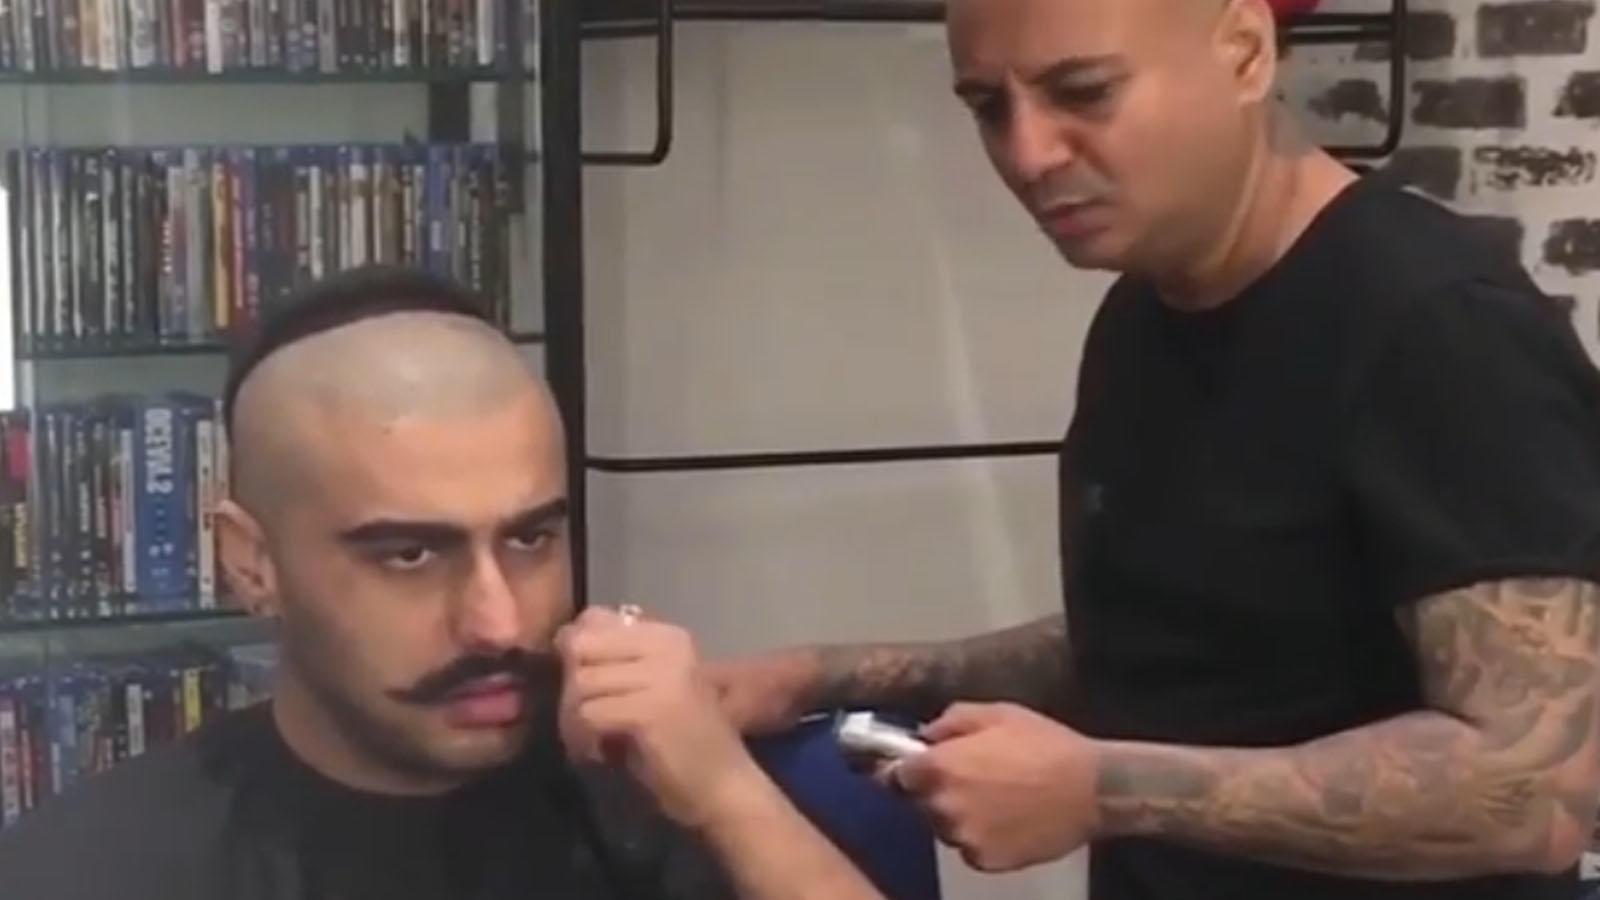 Malaika Arora gives a priceless reaction to beau Arjun Kapoor's BTS video of going bald for 'Panipat'